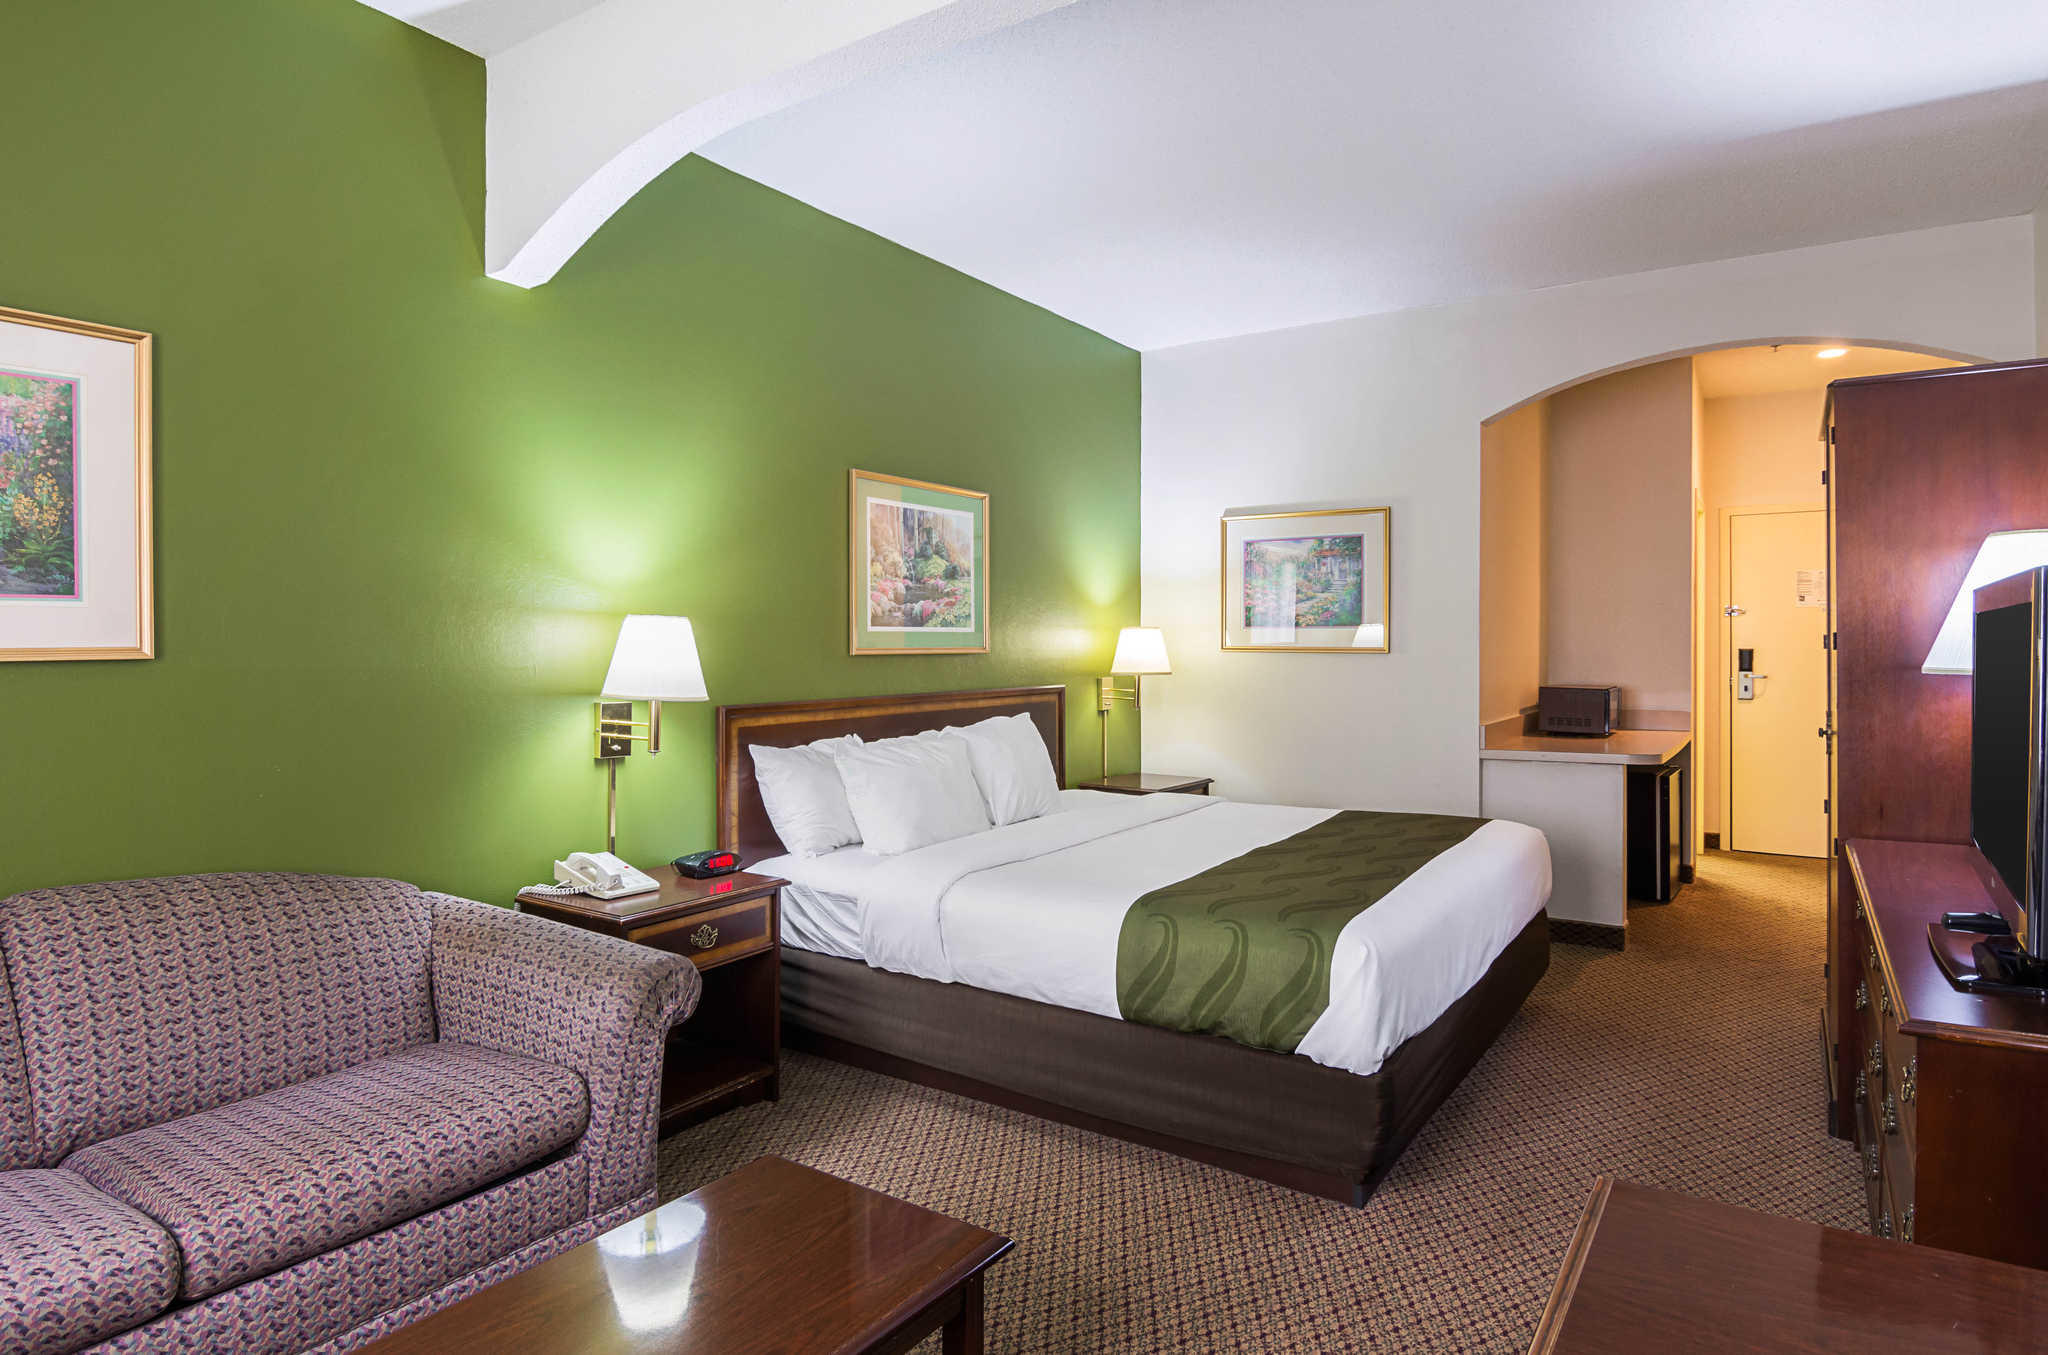 Quality Inn & Suites Kearneysville - Martinsburg image 17